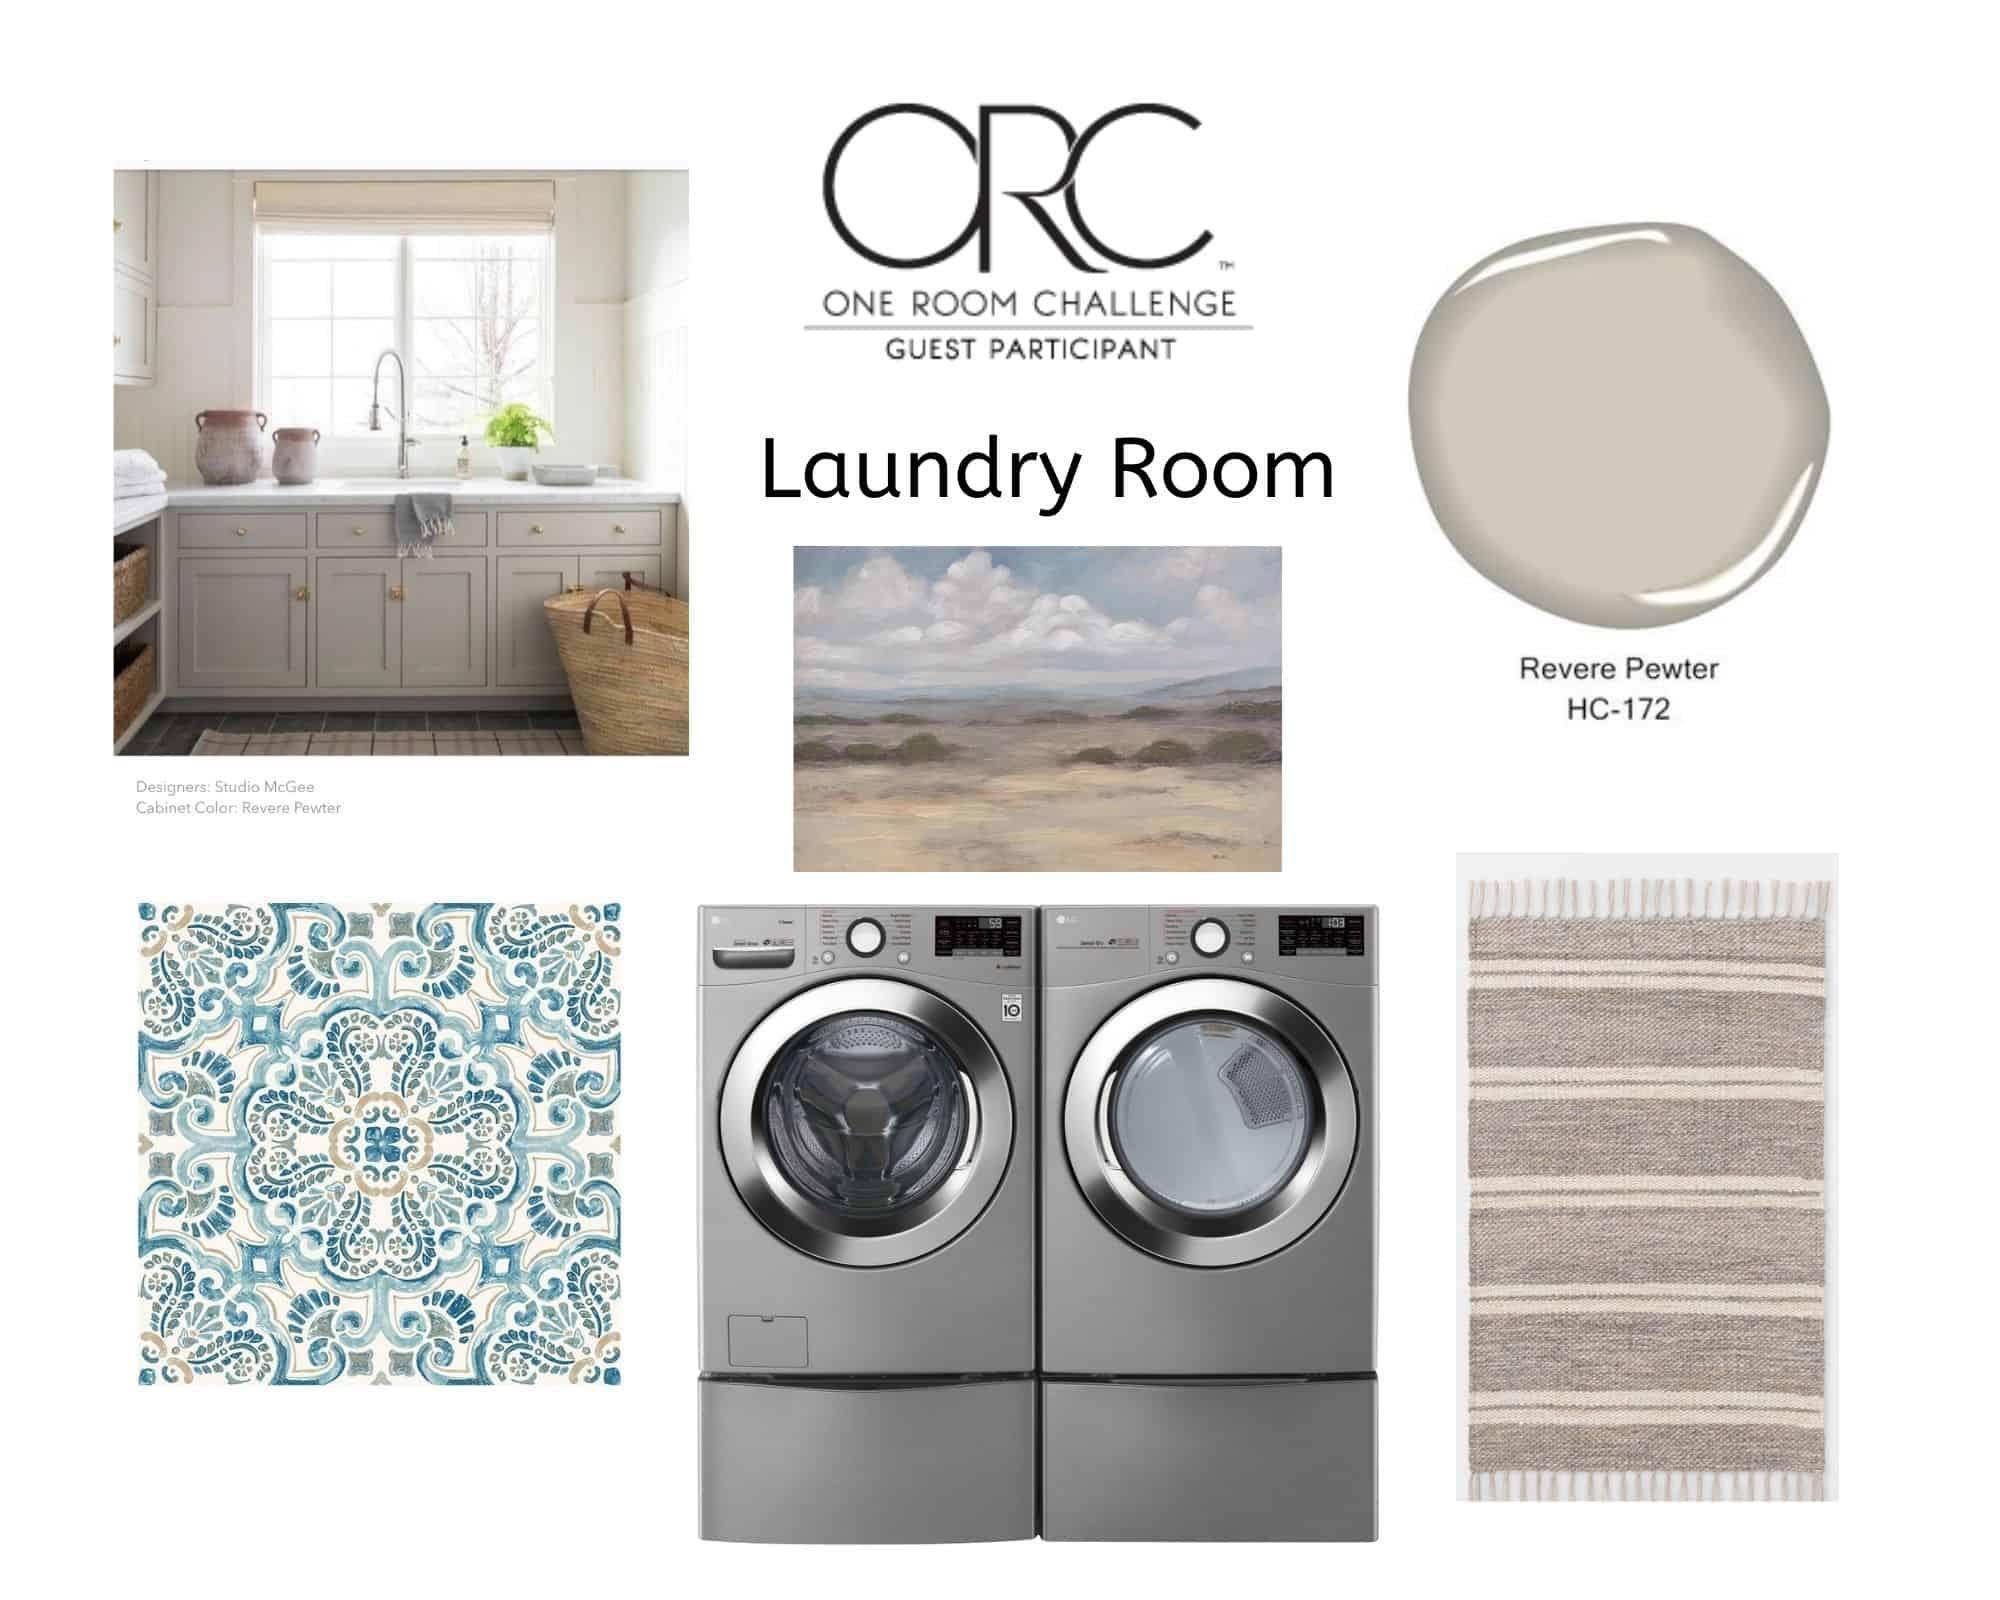 One Room challenge laundry room